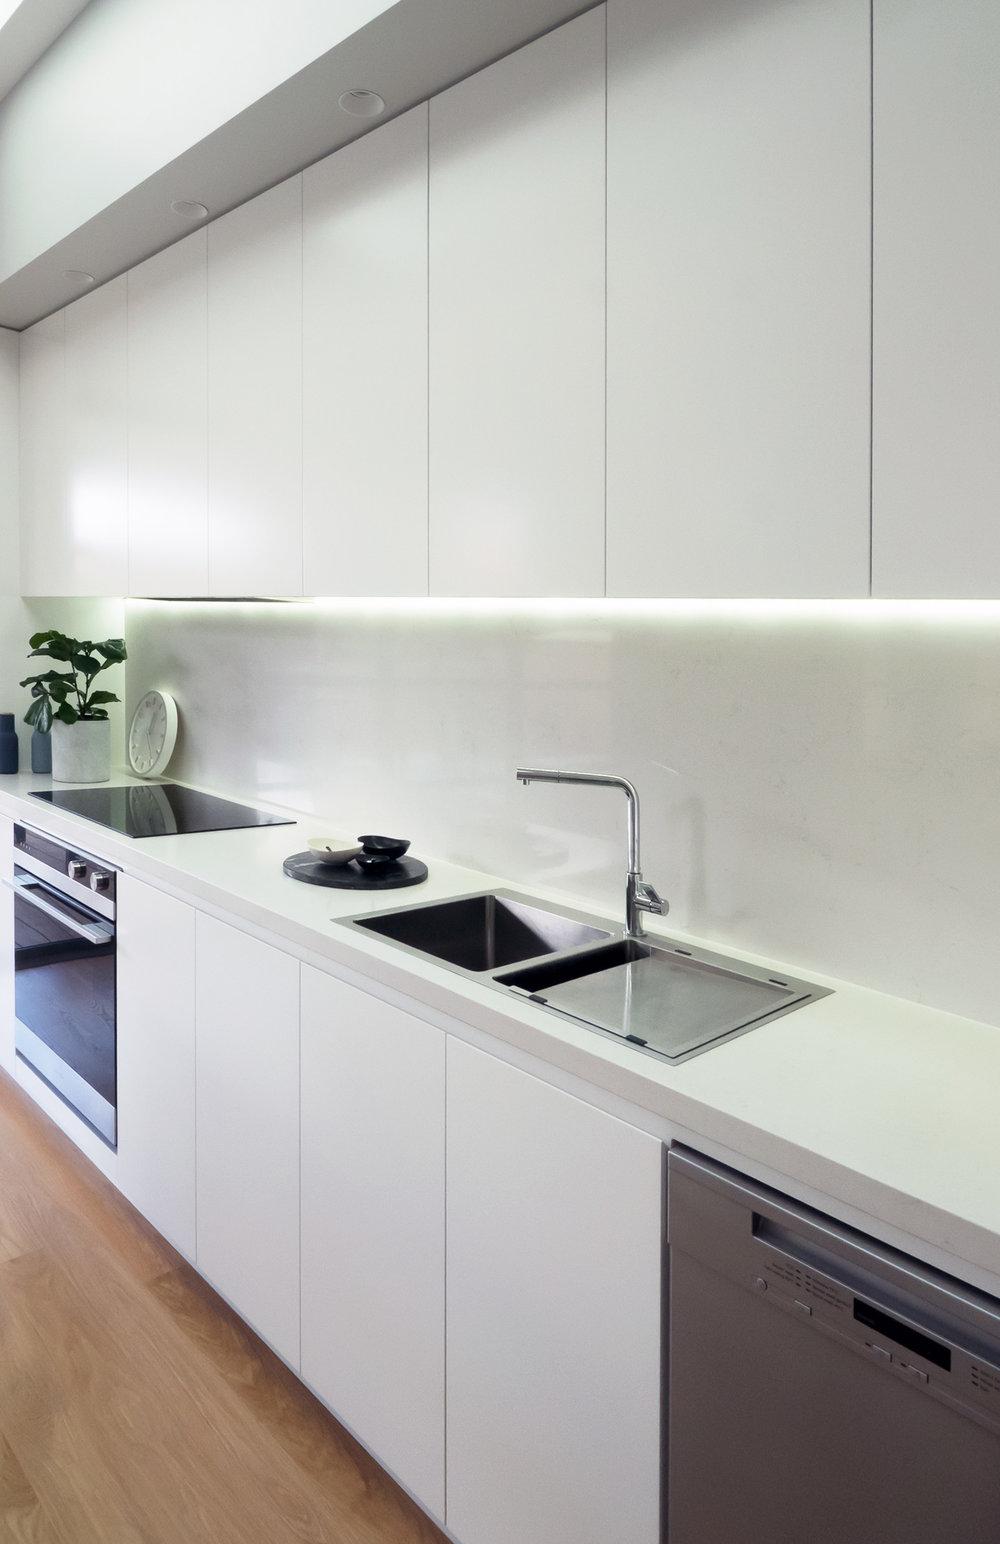 Sav Kitchen Back Wall19.jpg